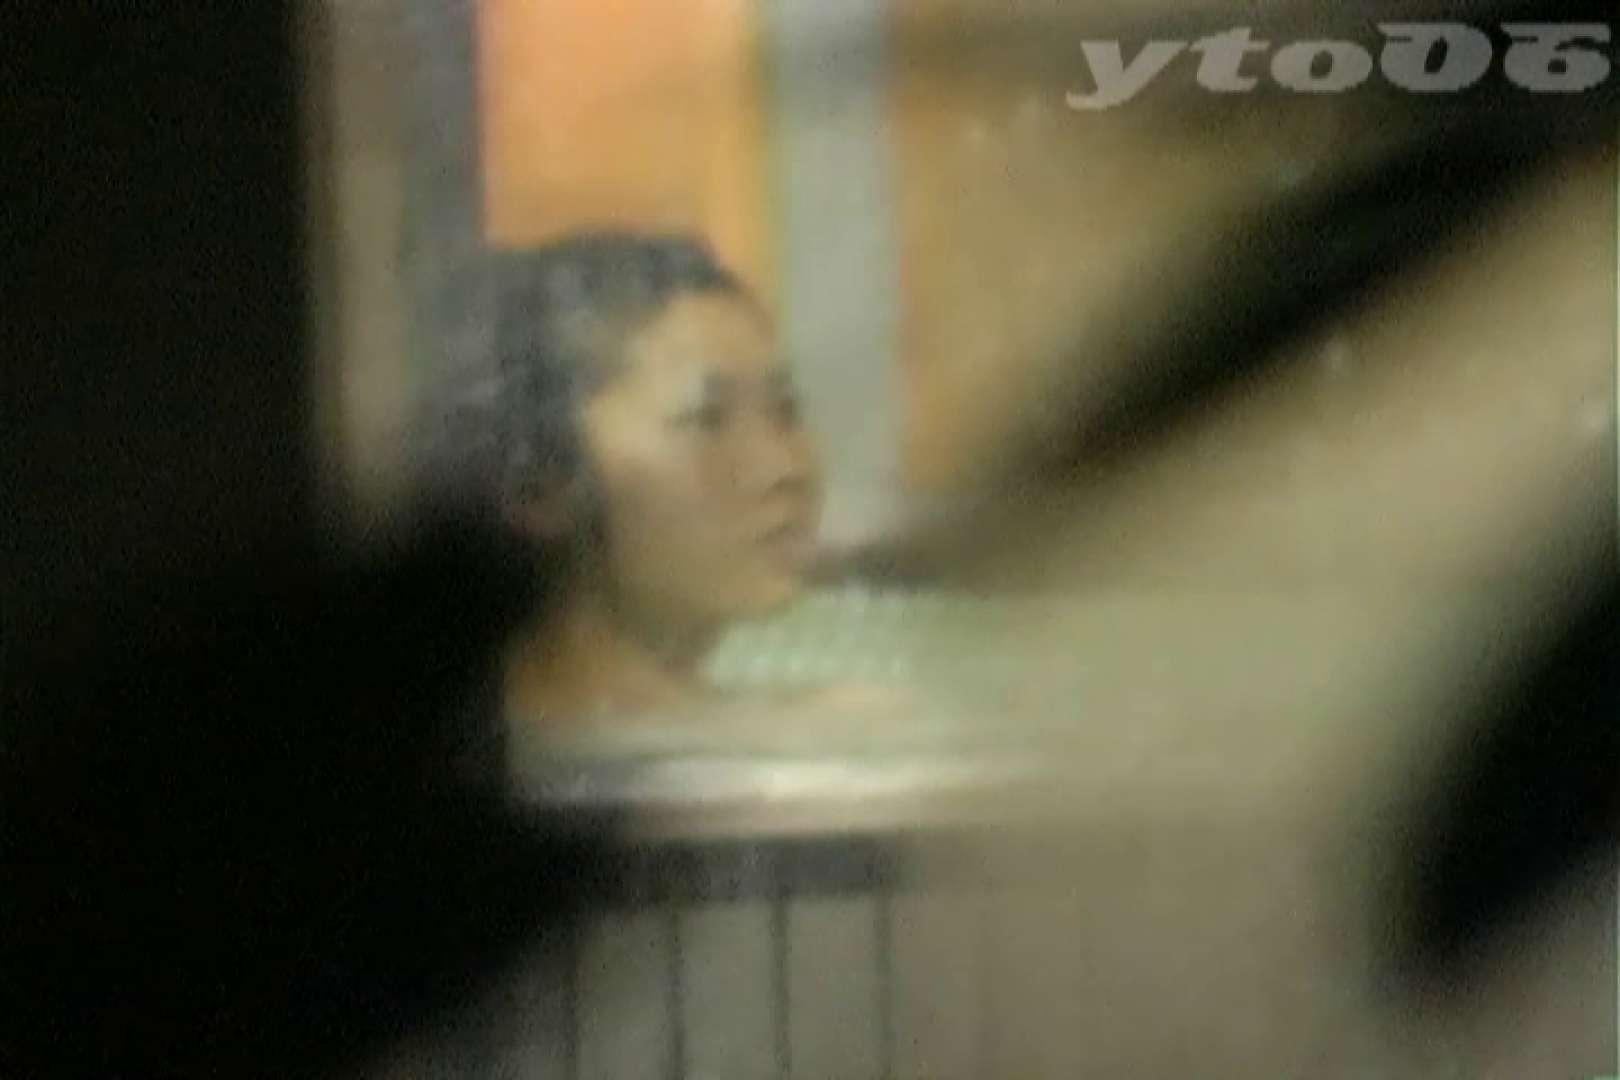 ▲復活限定▲合宿ホテル女風呂盗撮 Vol.36 盗撮 | 合宿  70pic 13